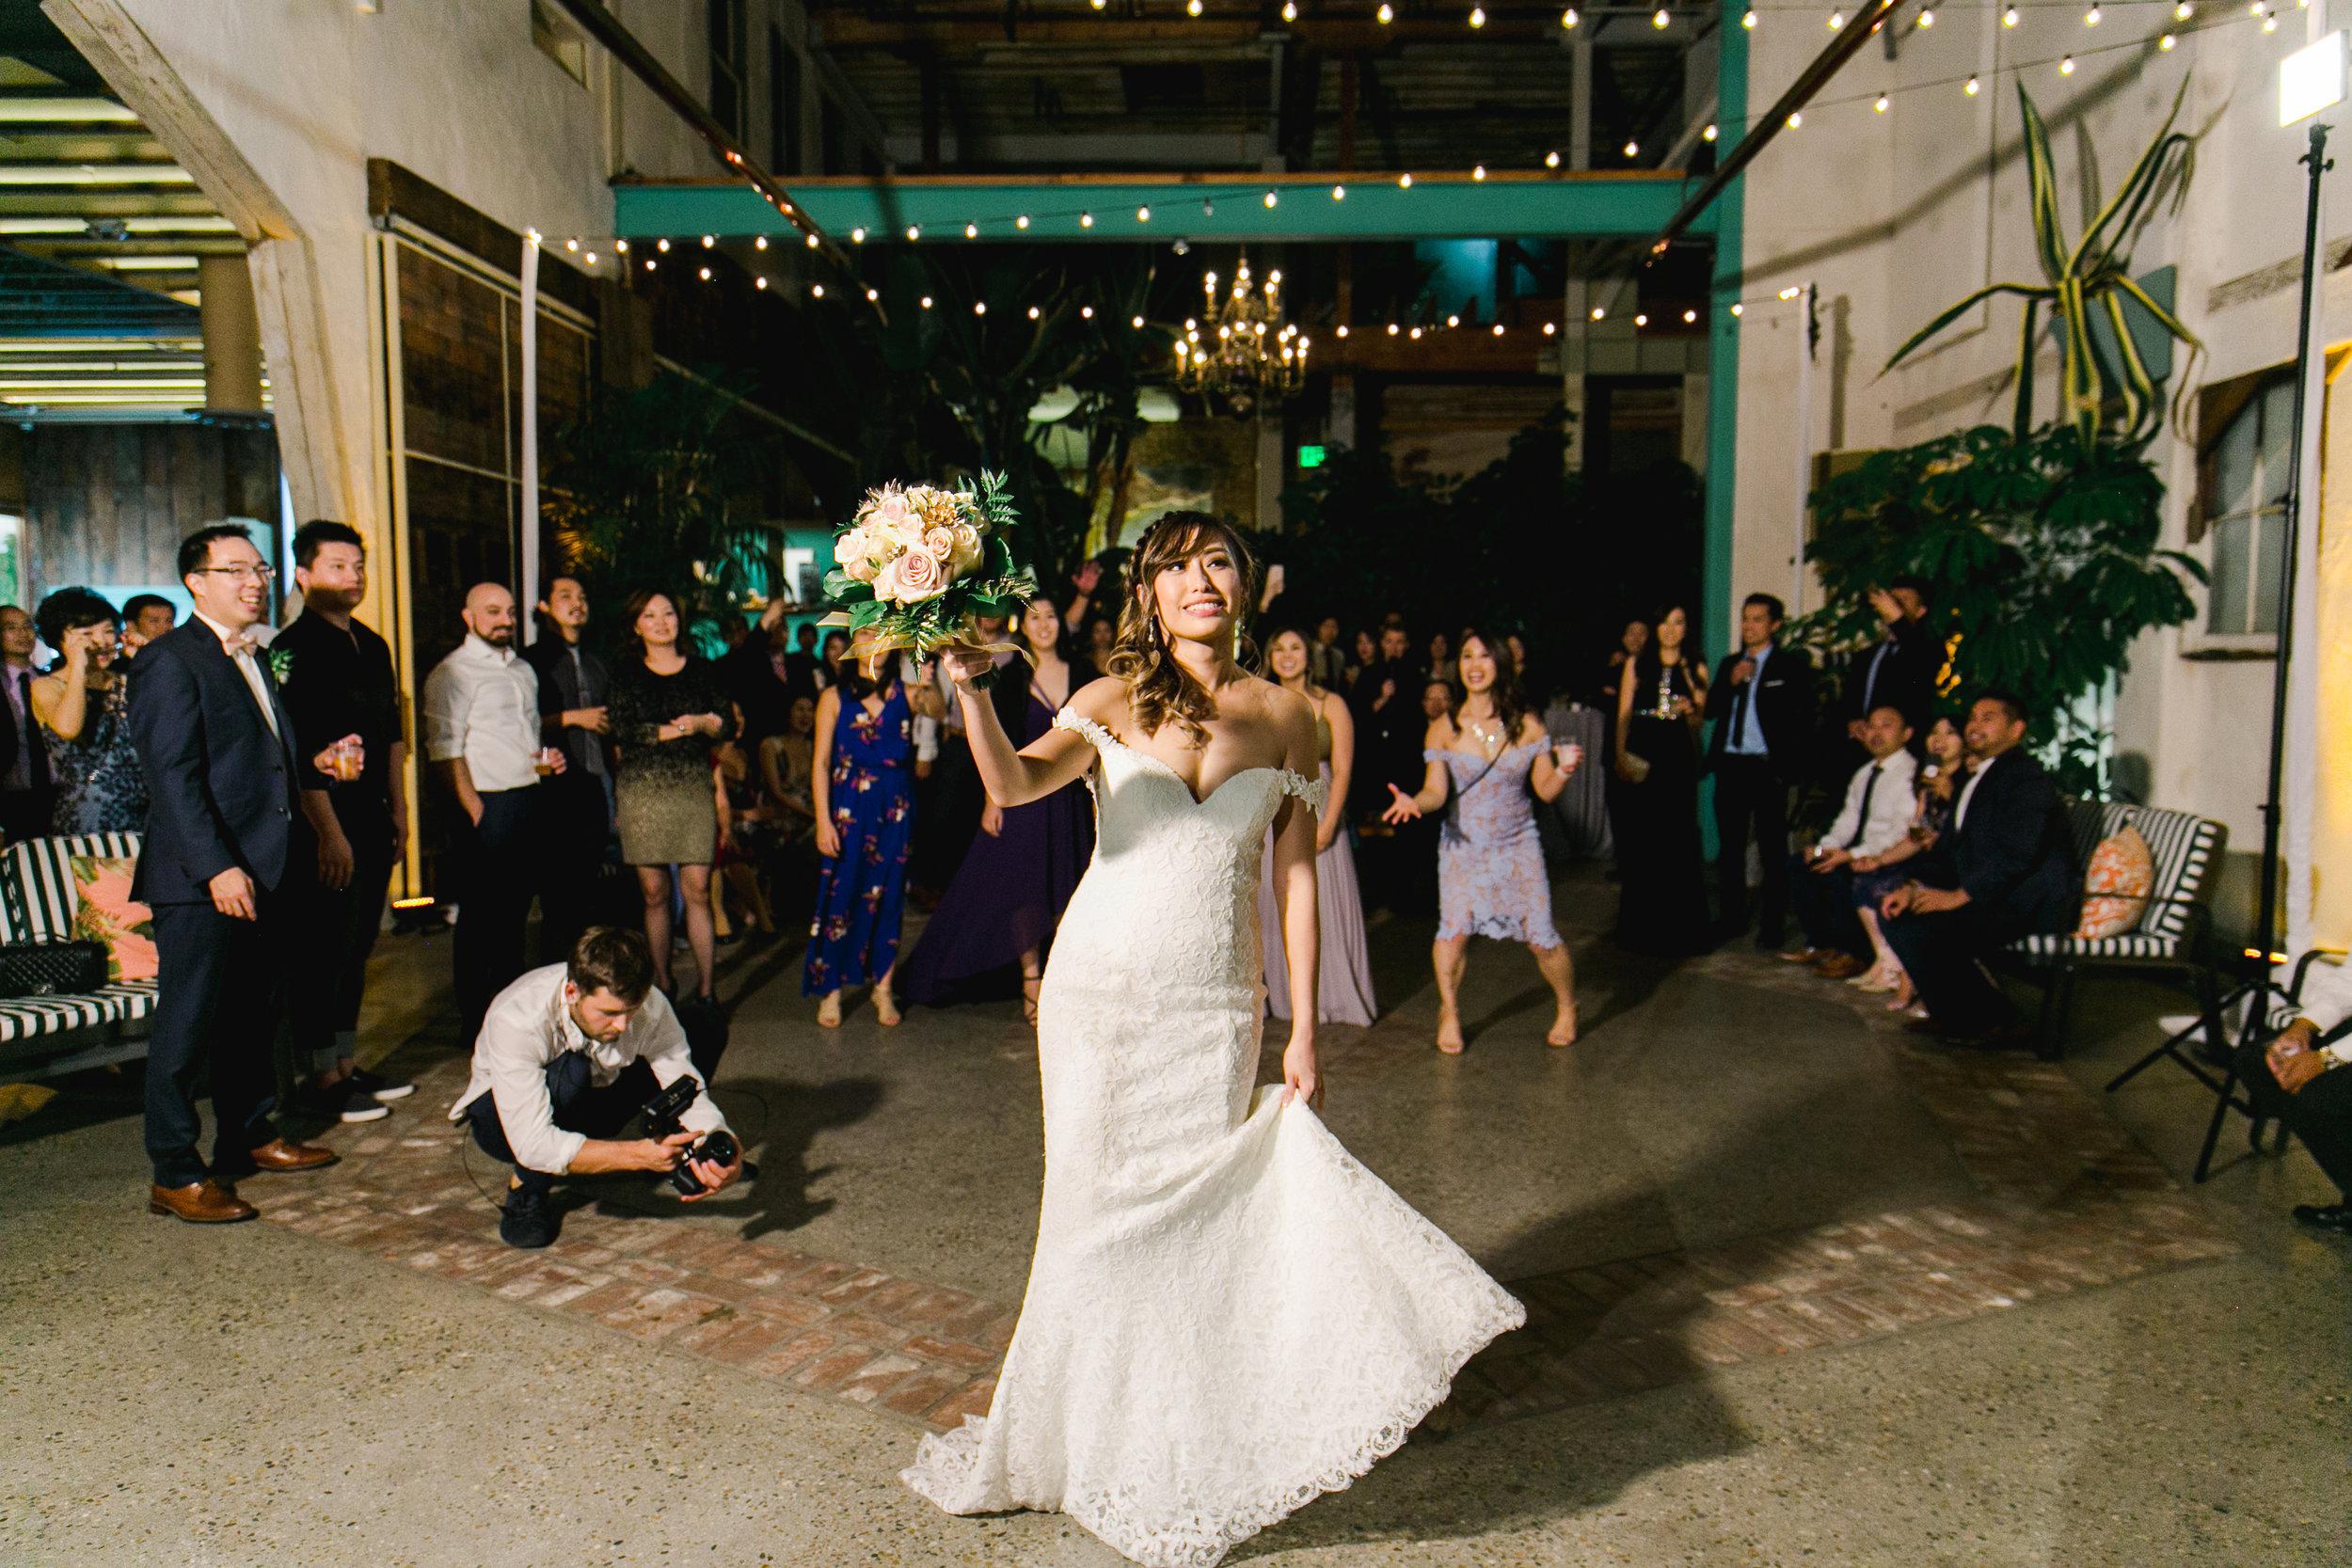 Wen-Hsin-Kevin-Wedding-769.jpg